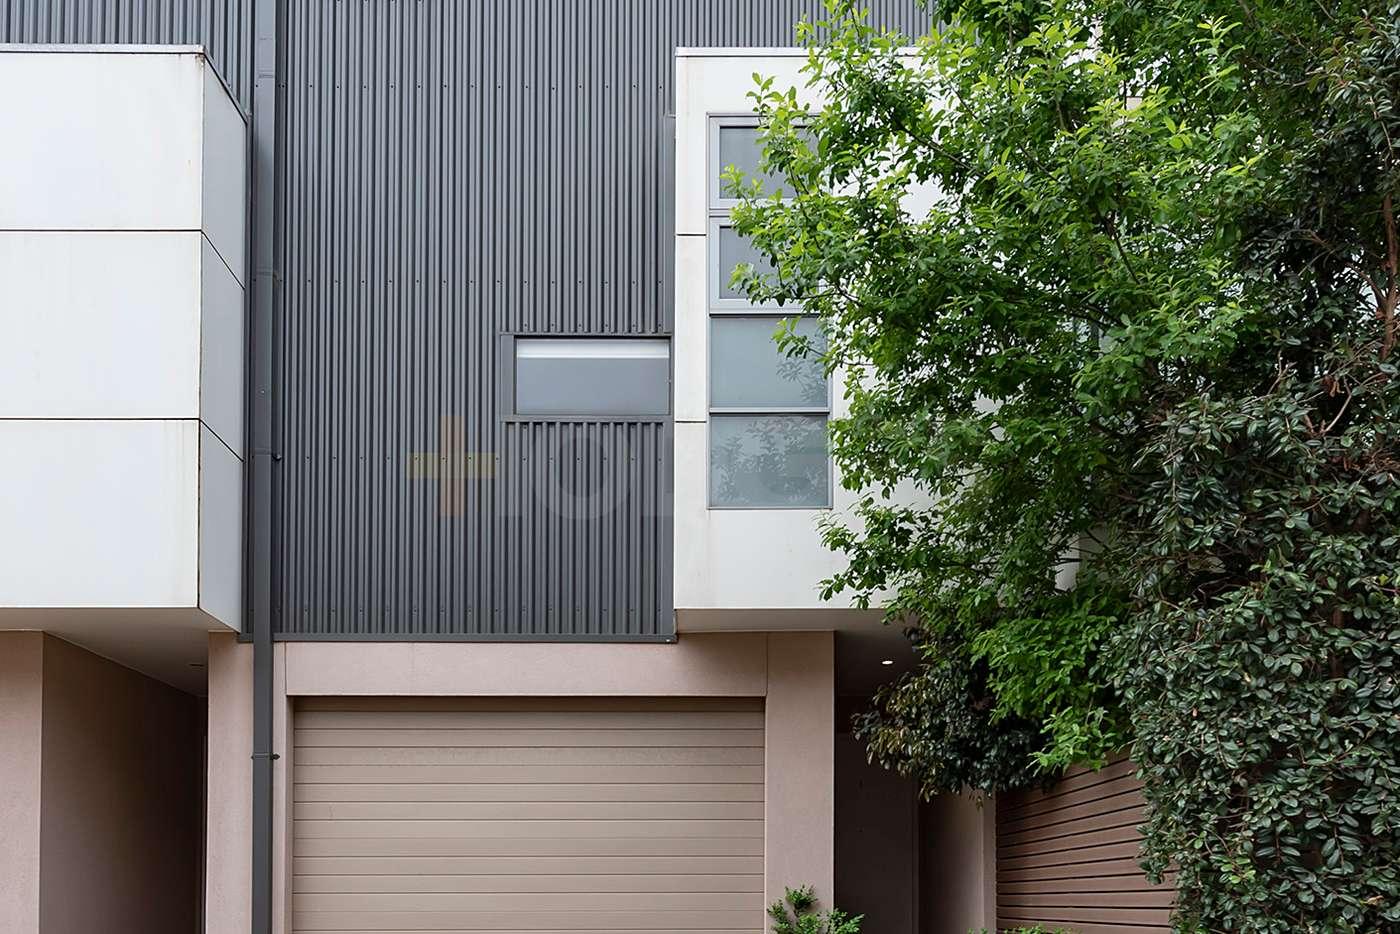 Main view of Homely townhouse listing, 8/30 Sydenham  Street, Seddon VIC 3011